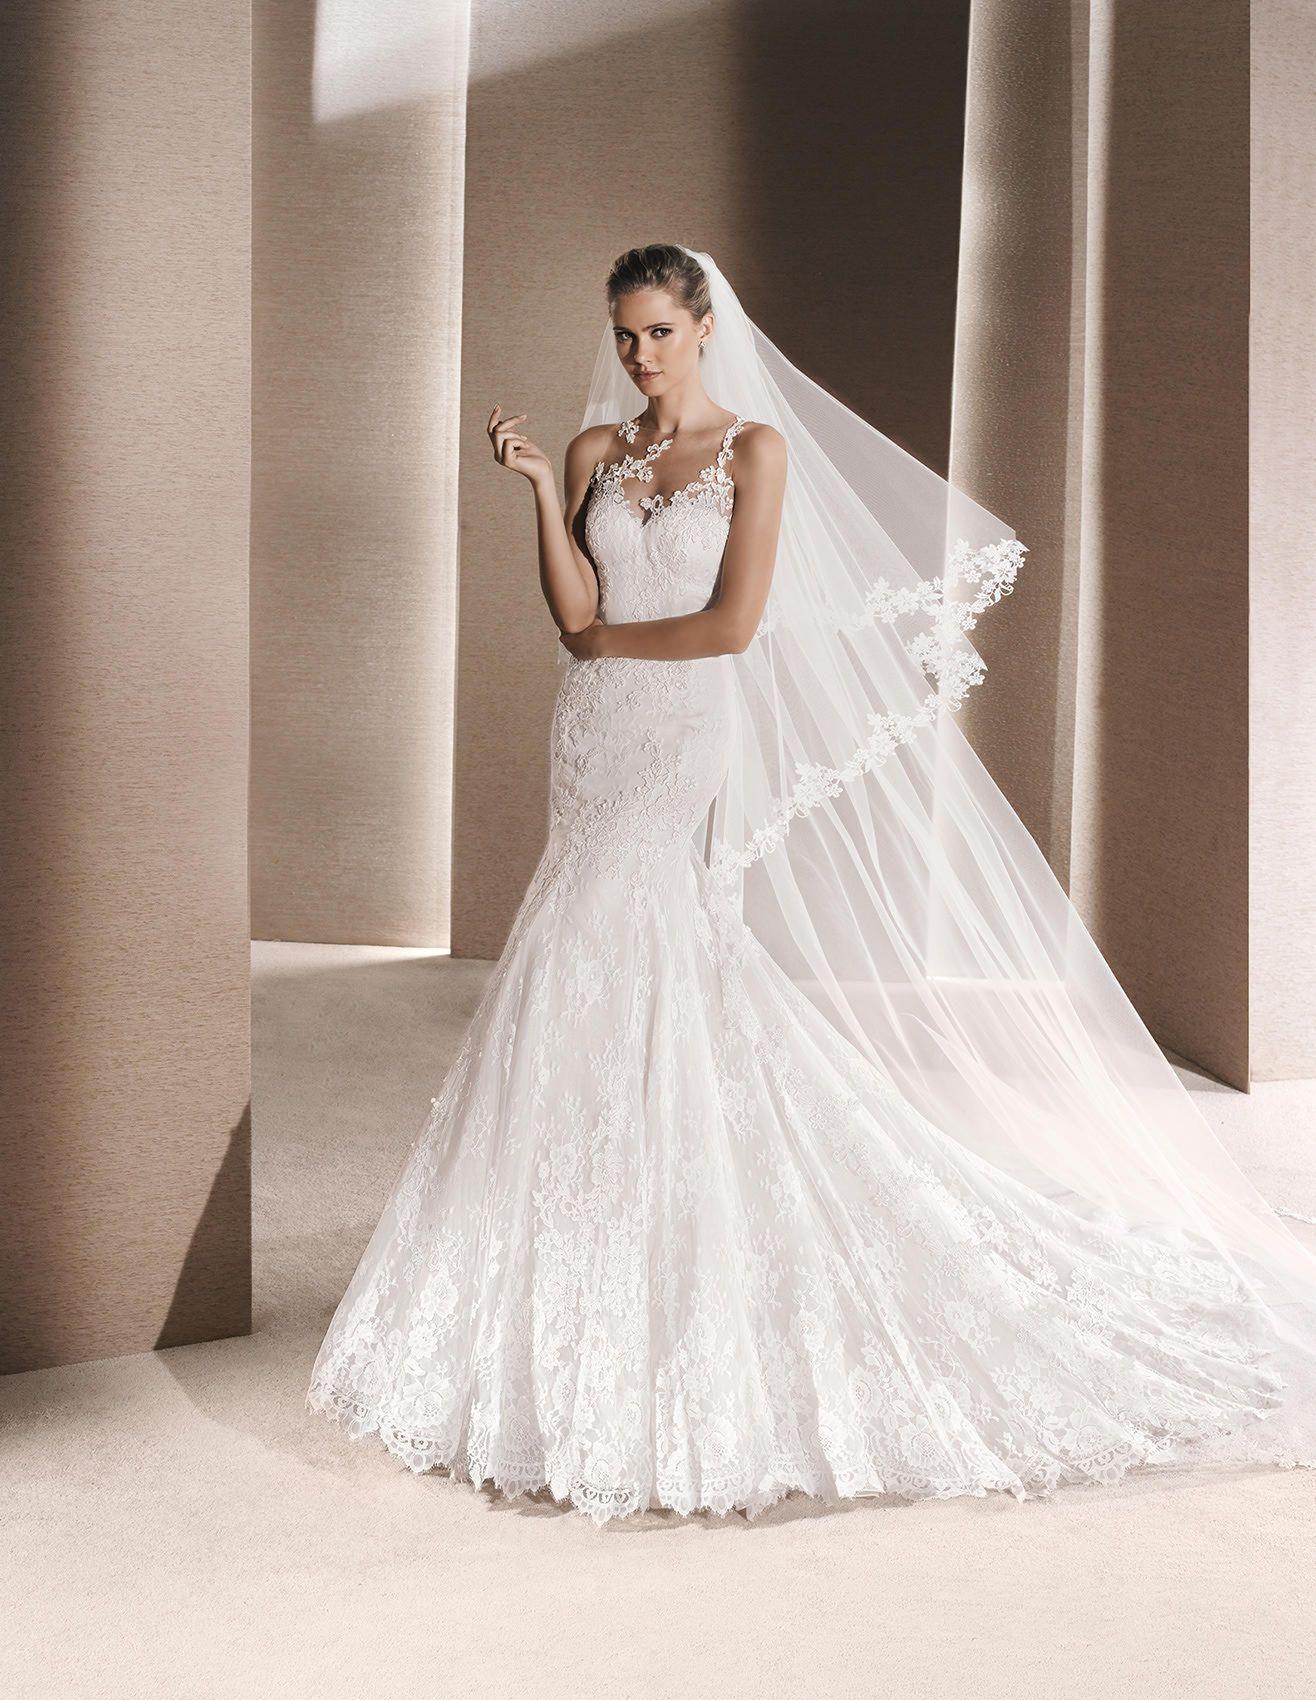 RUSTICA - Mermaid wedding dress with sweetheart neckline | La Sposa